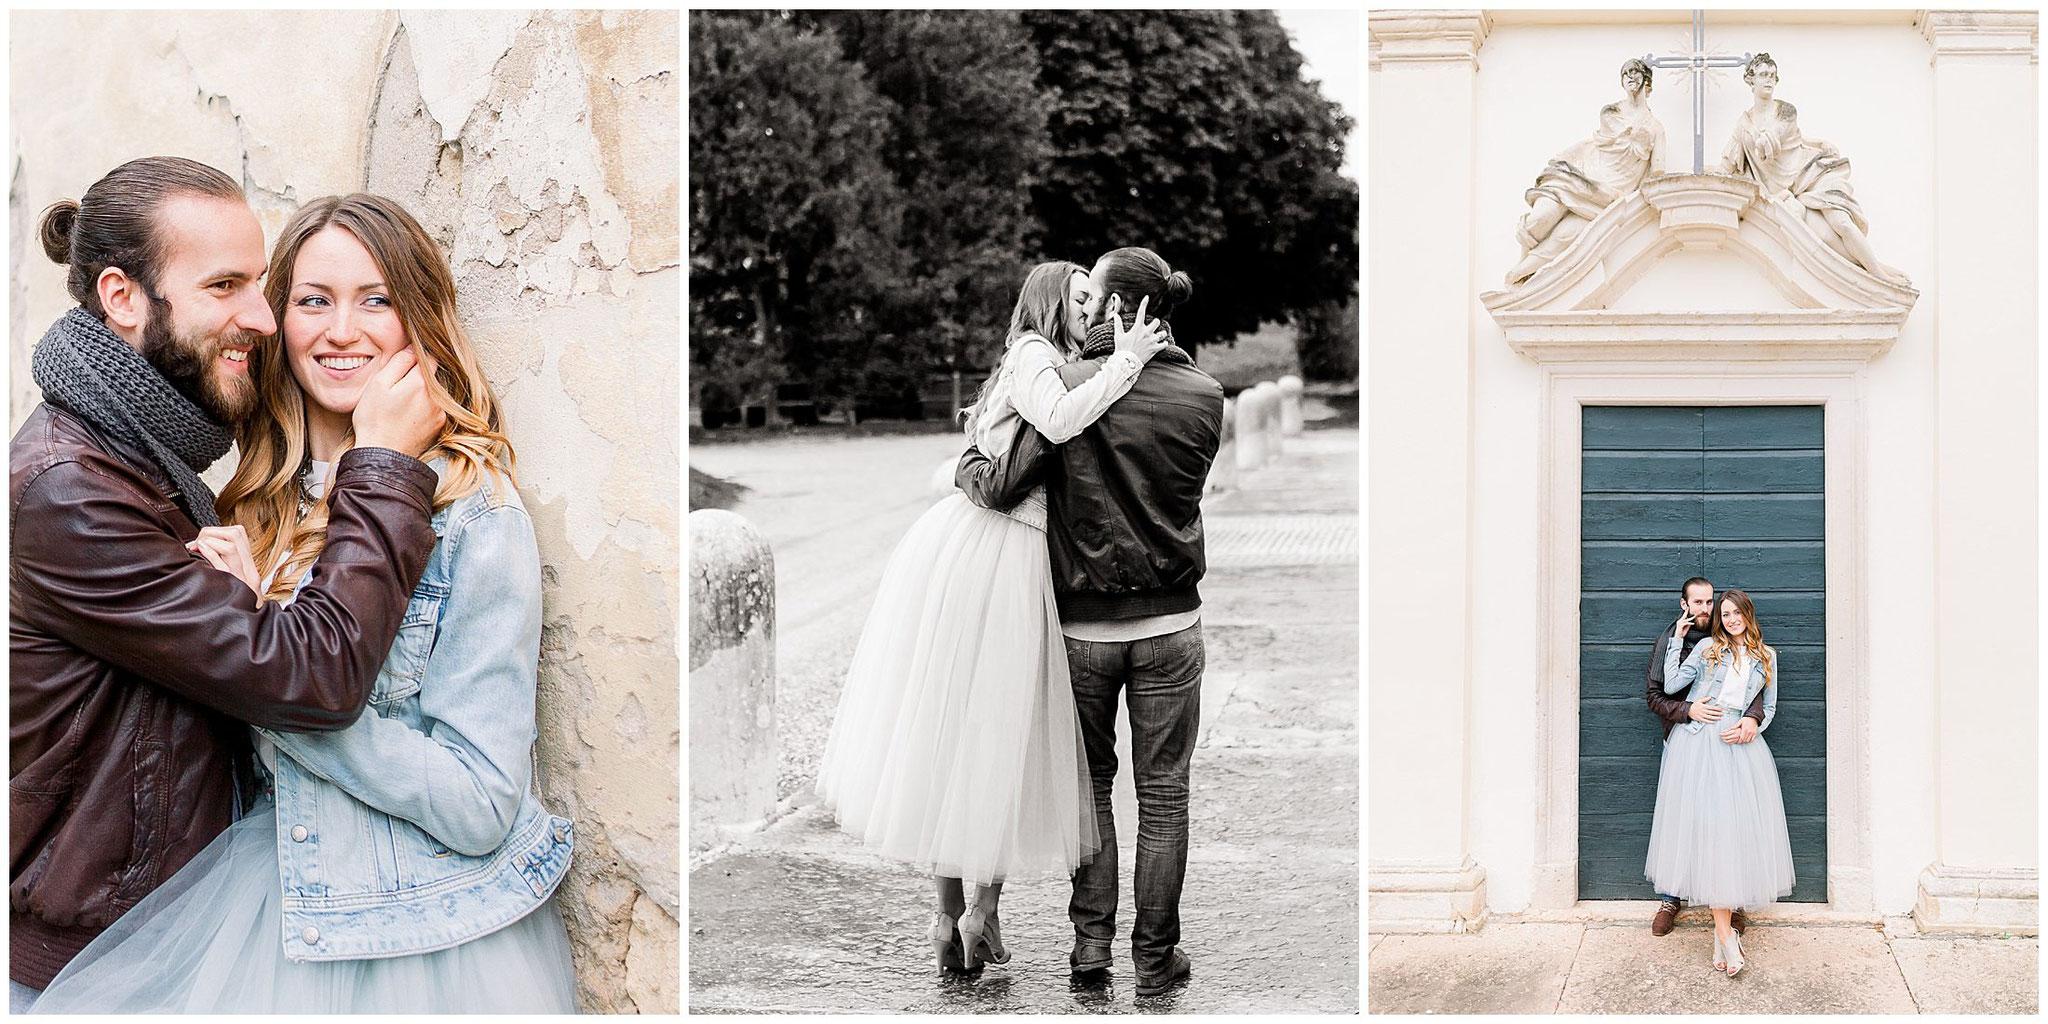 verlobungsshooting Italien Toskana hochzeitsfotograf Jane weber tüllrock